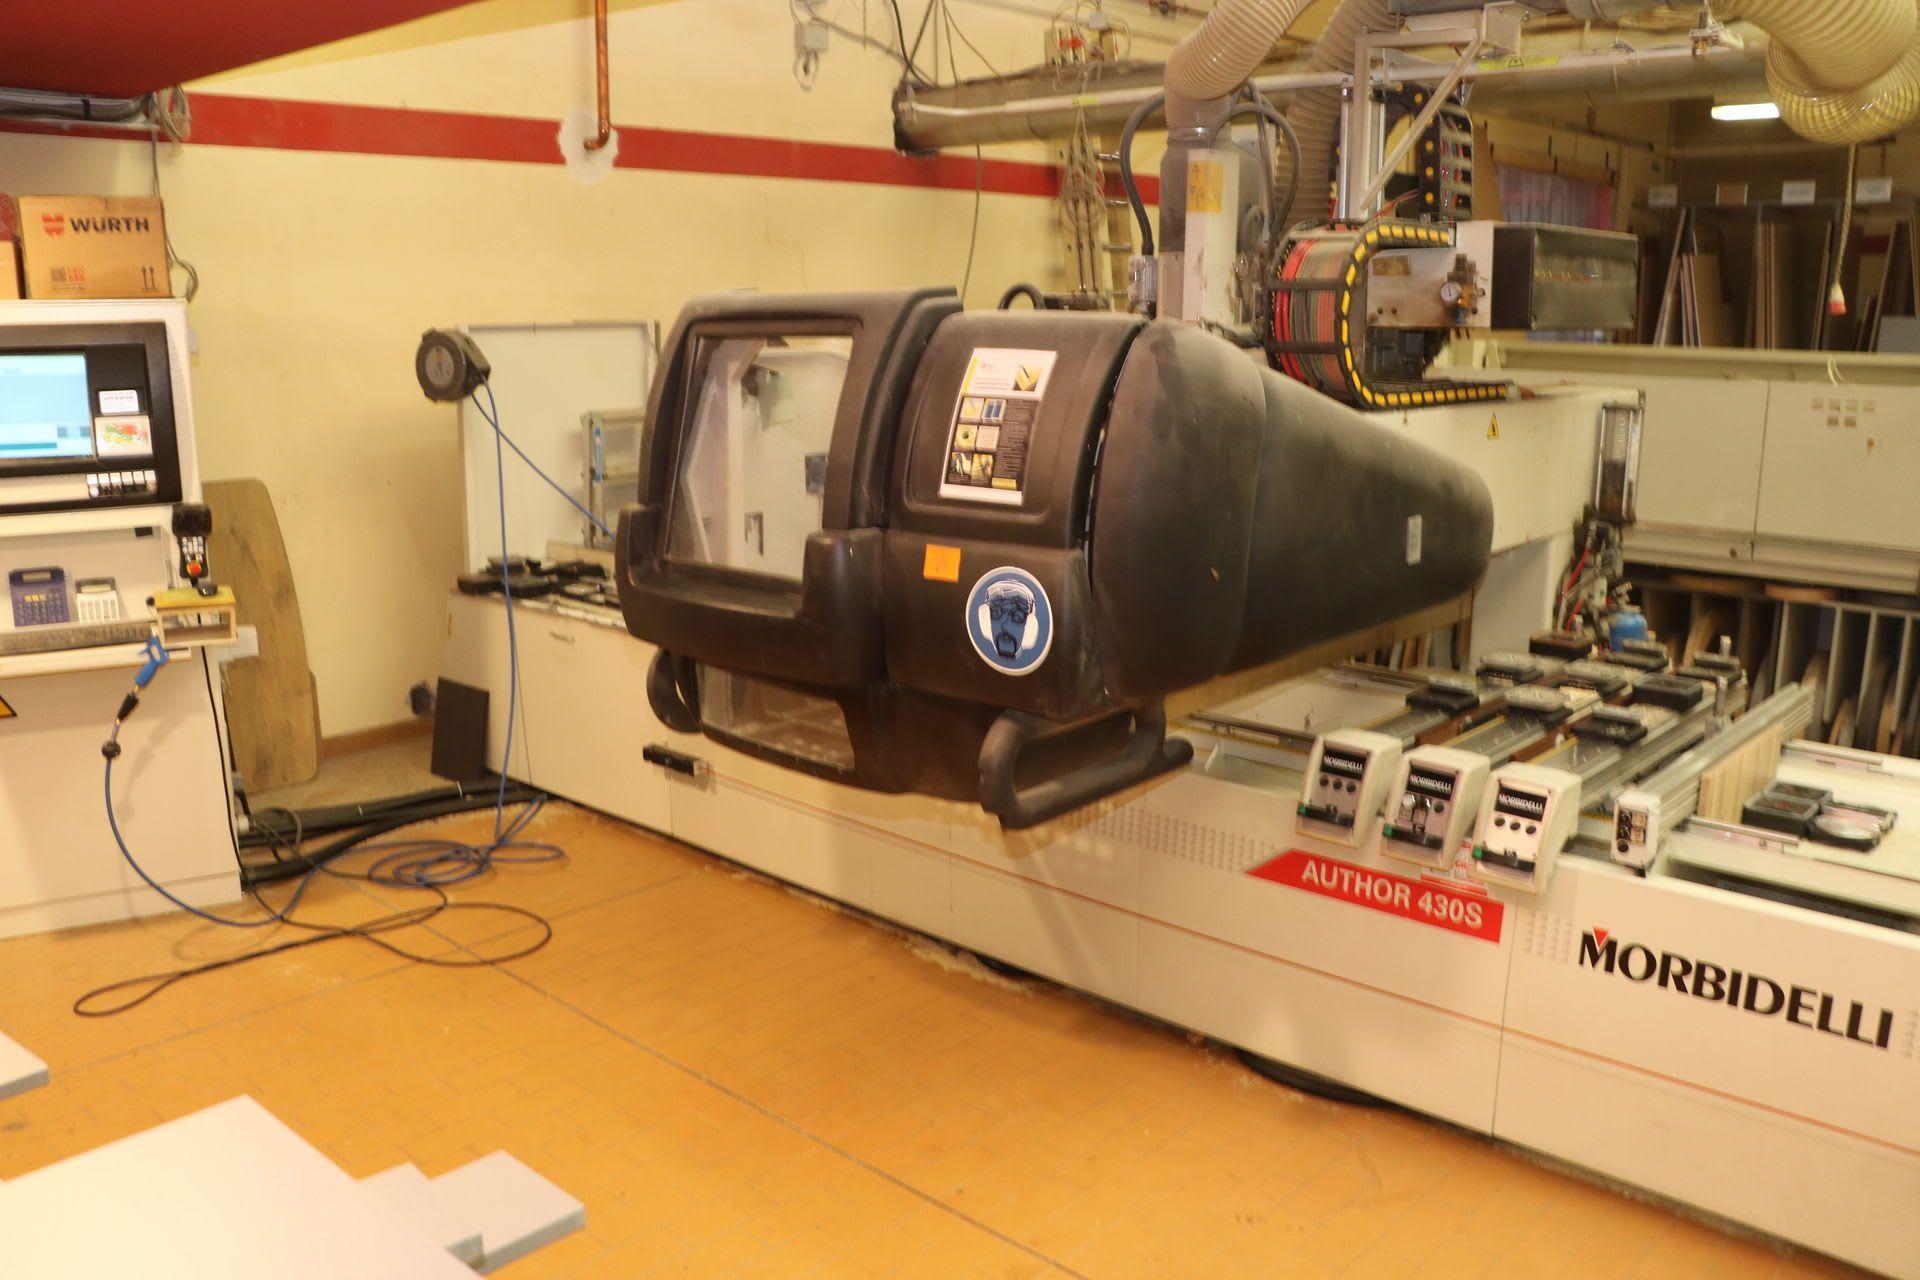 MORBIDELLI Author 430 Super CNC-Bearbeitungszentrum